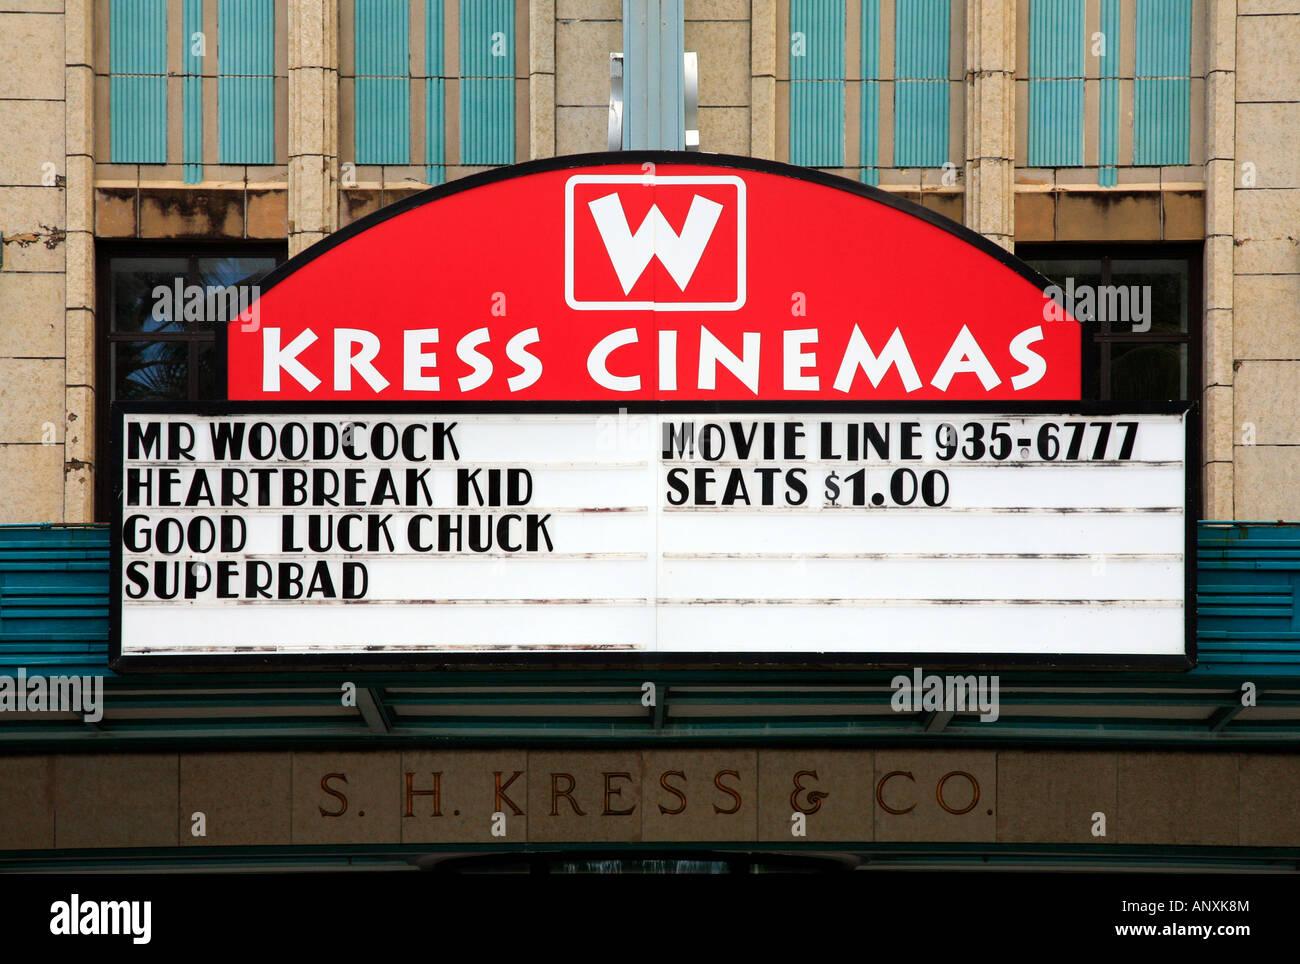 Facade of Kress cinema in Hilo Hawaii - Stock Image